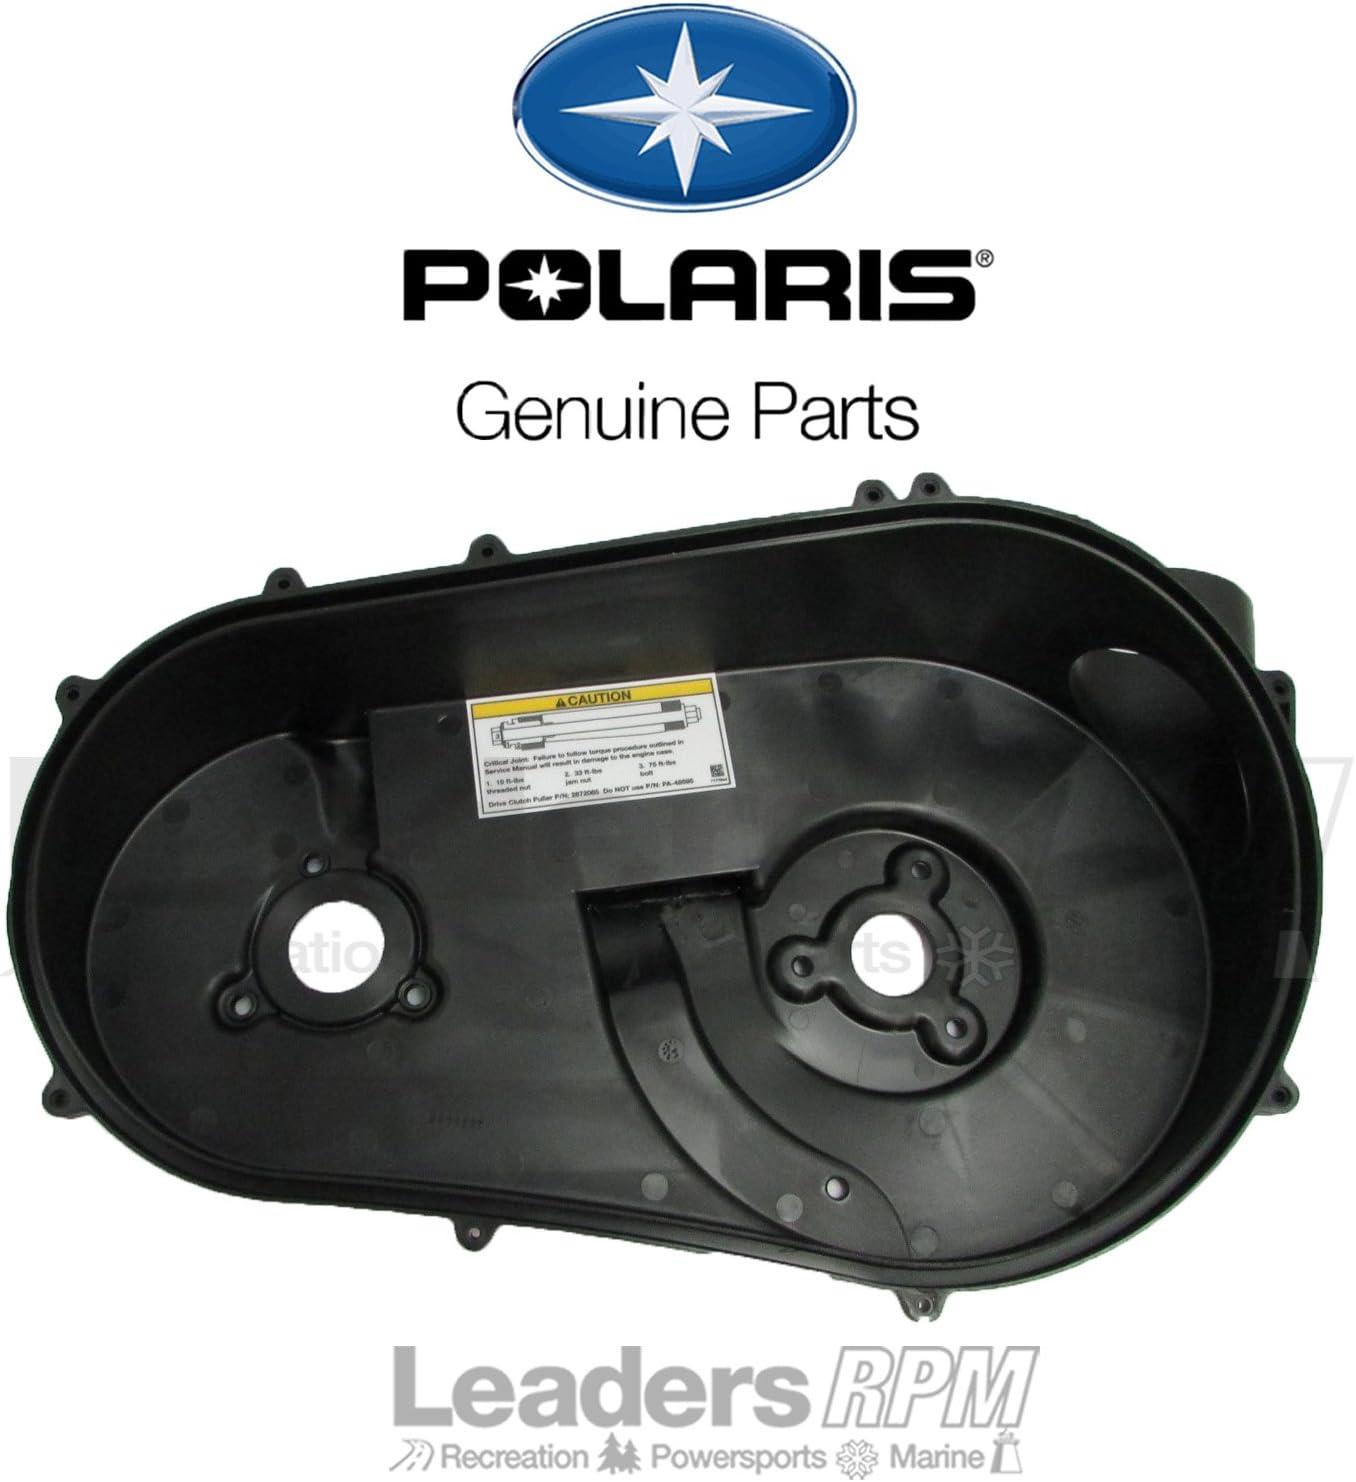 Polaris 2011-2016 Military Rzr Xp Mv 900 Rzr Xp 900 Cover Clutch Inner 5438327 New Oem